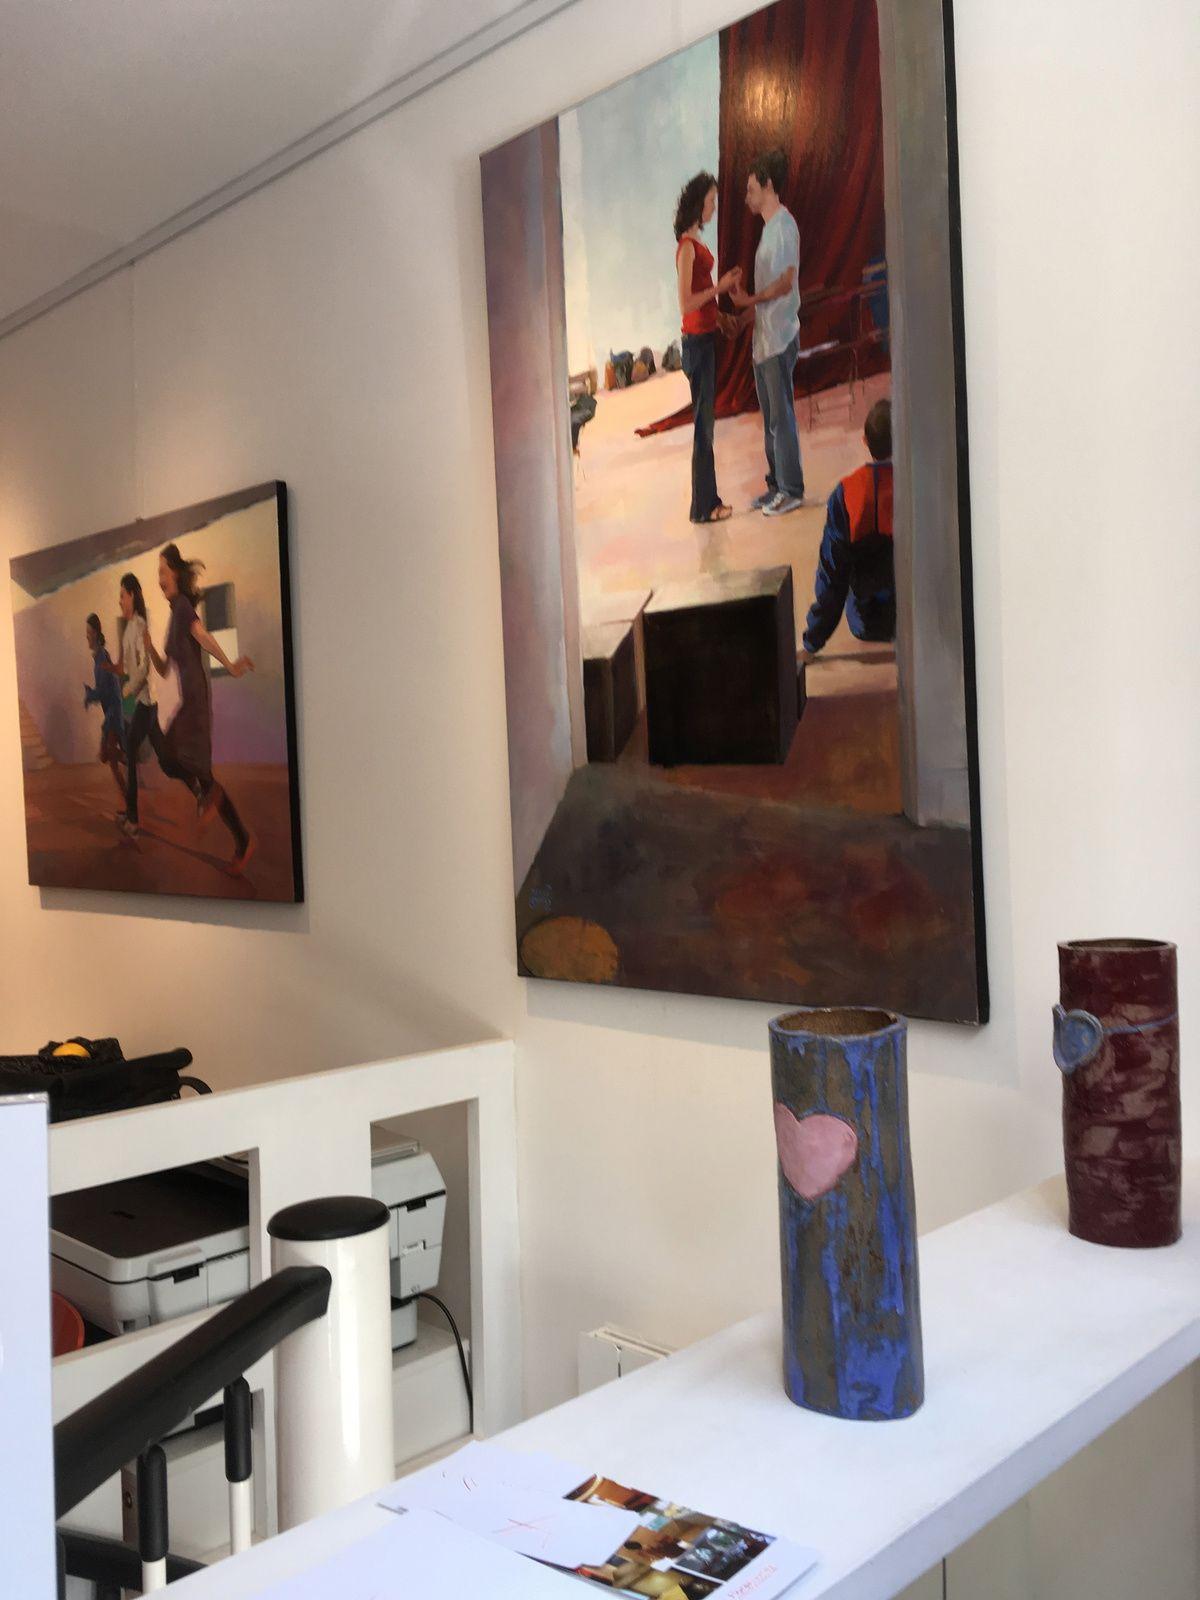 Exposition des peintures de Béatrice Roche Gardies